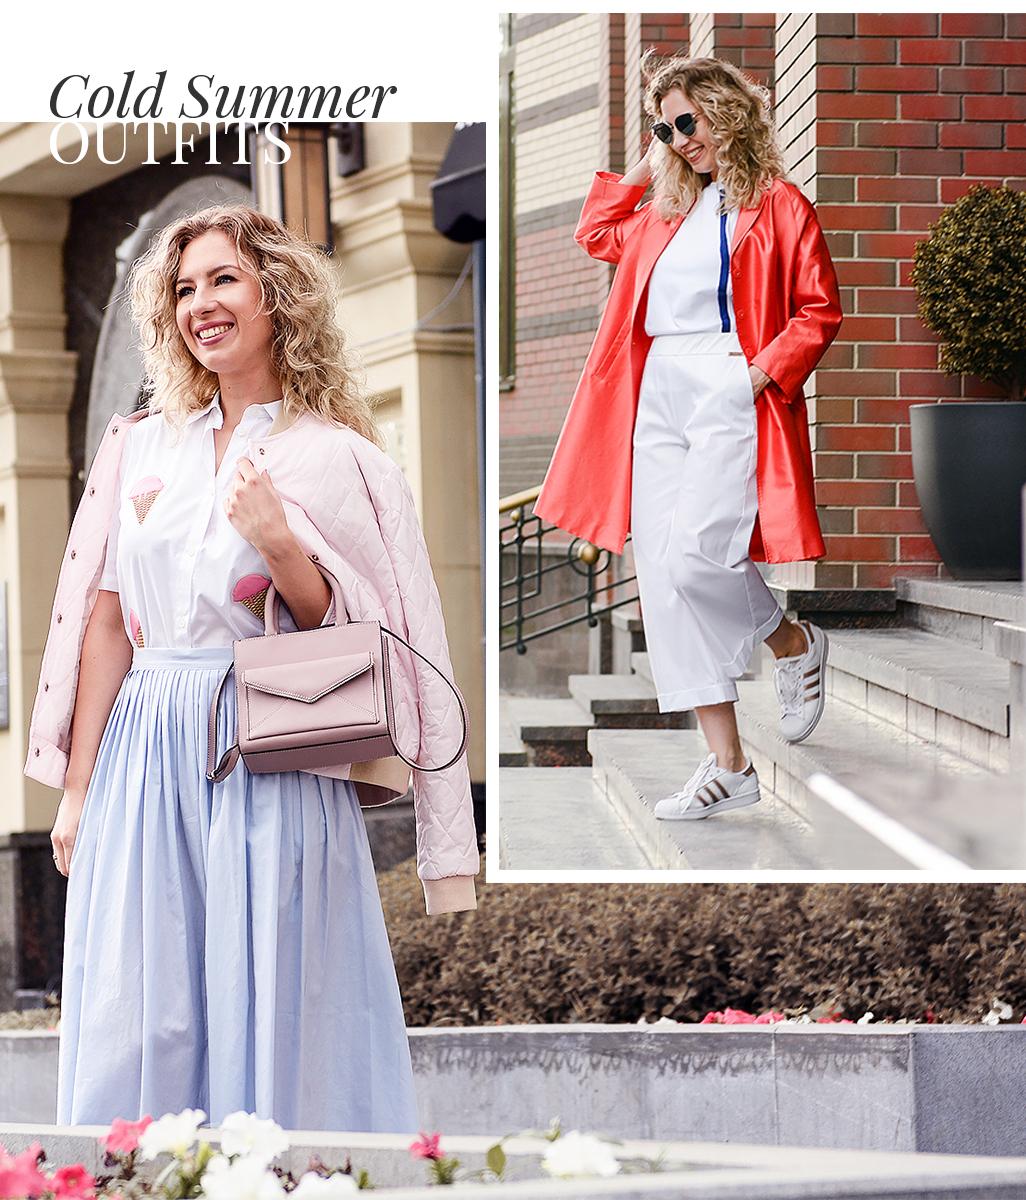 rita_maslova_italbazar_pastel_outfit_cold_summer_looks_sport_casual_orange_coat